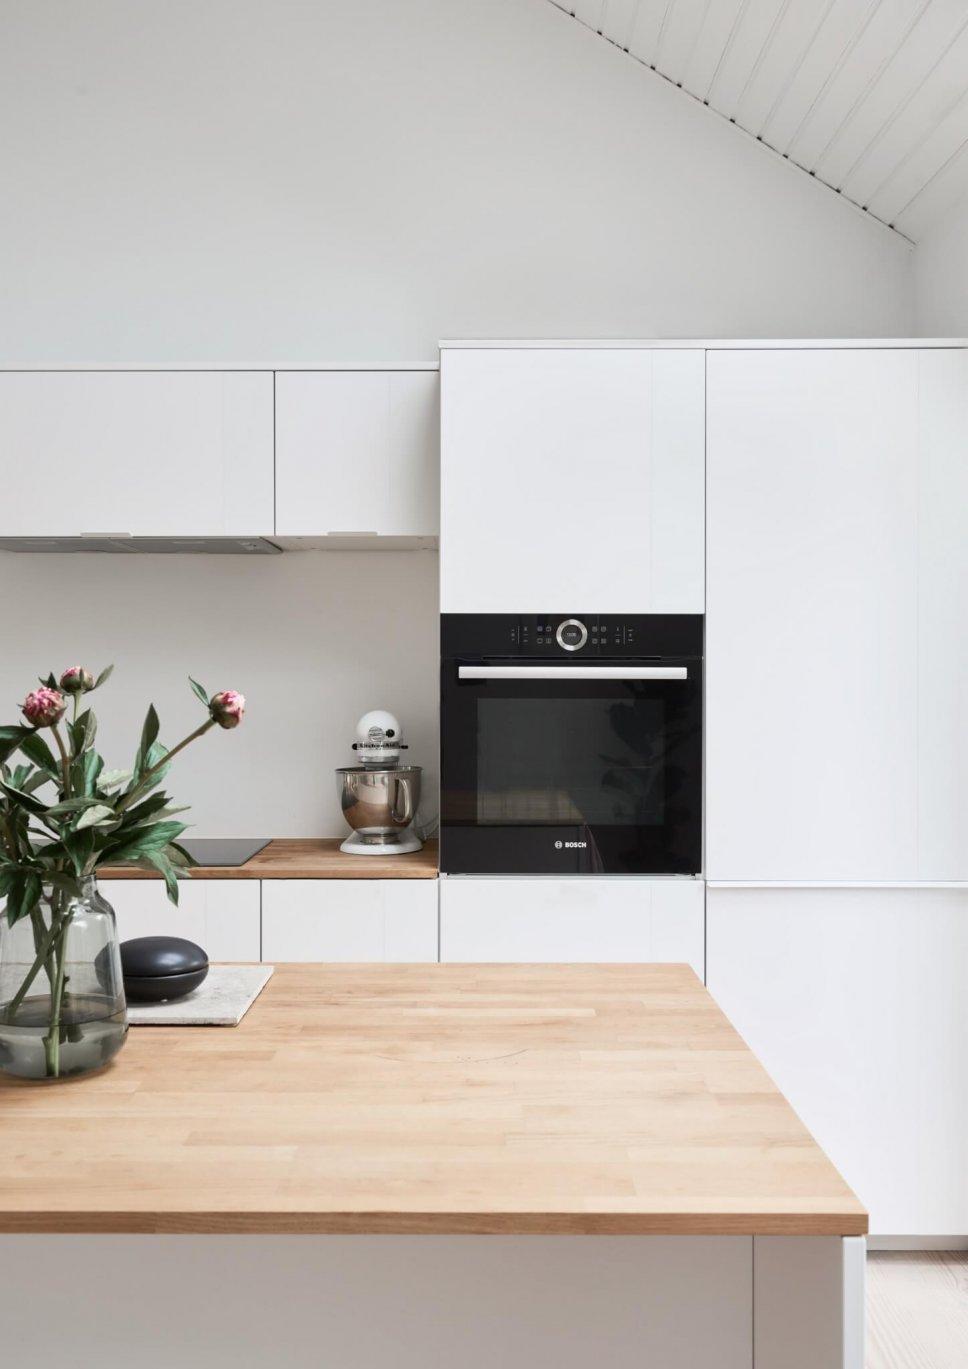 feine fronten f r ikea k chen designigel. Black Bedroom Furniture Sets. Home Design Ideas